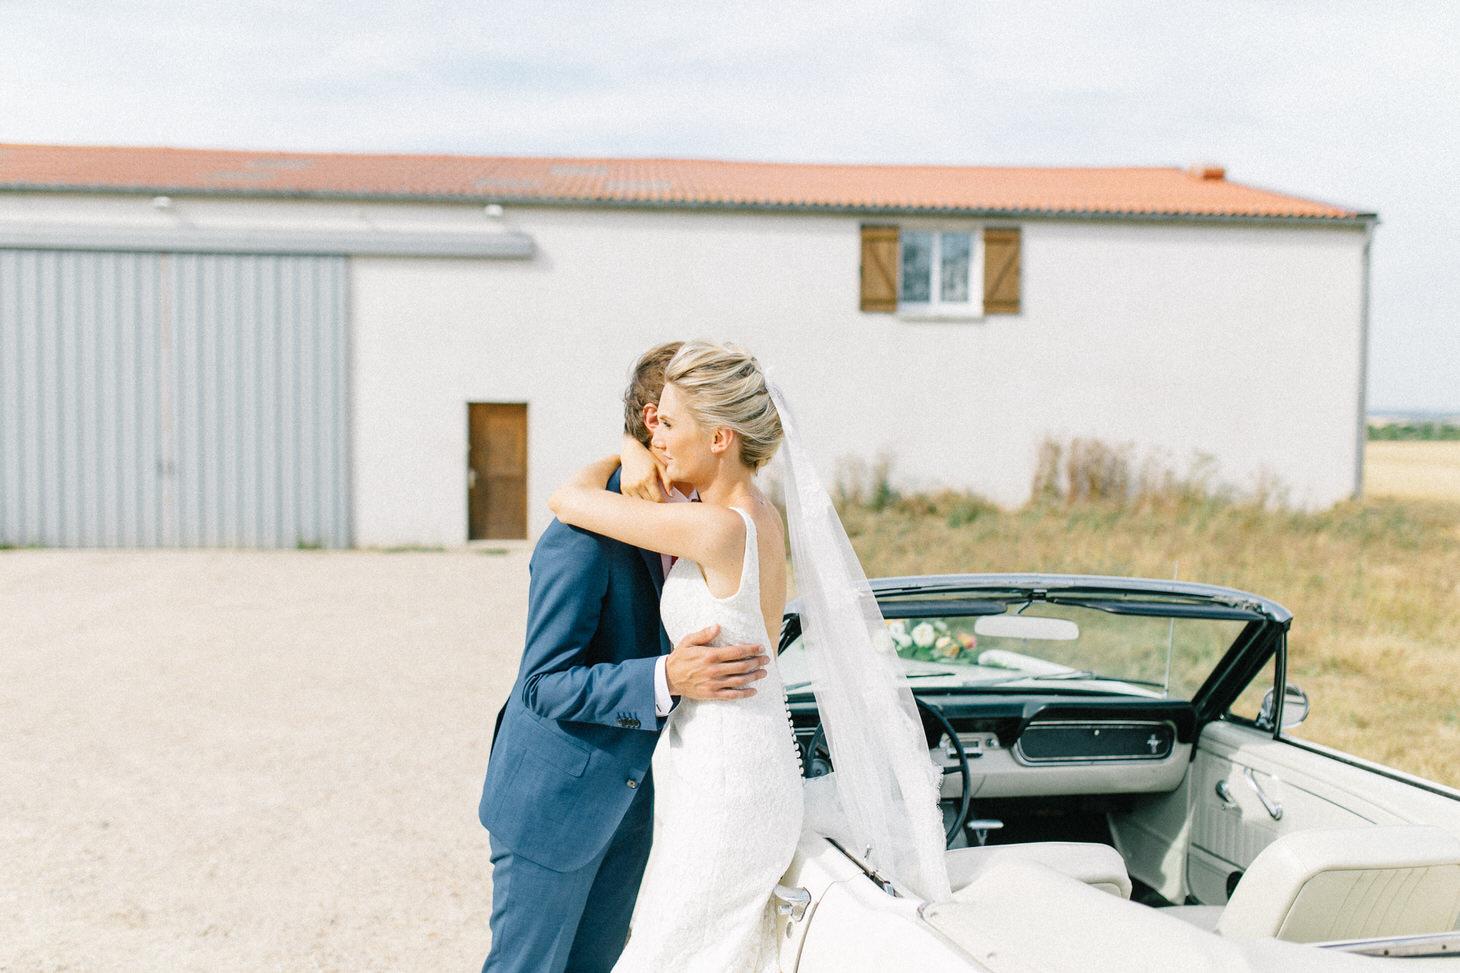 photographe-mariage-paris-montfort-l-amaury-047